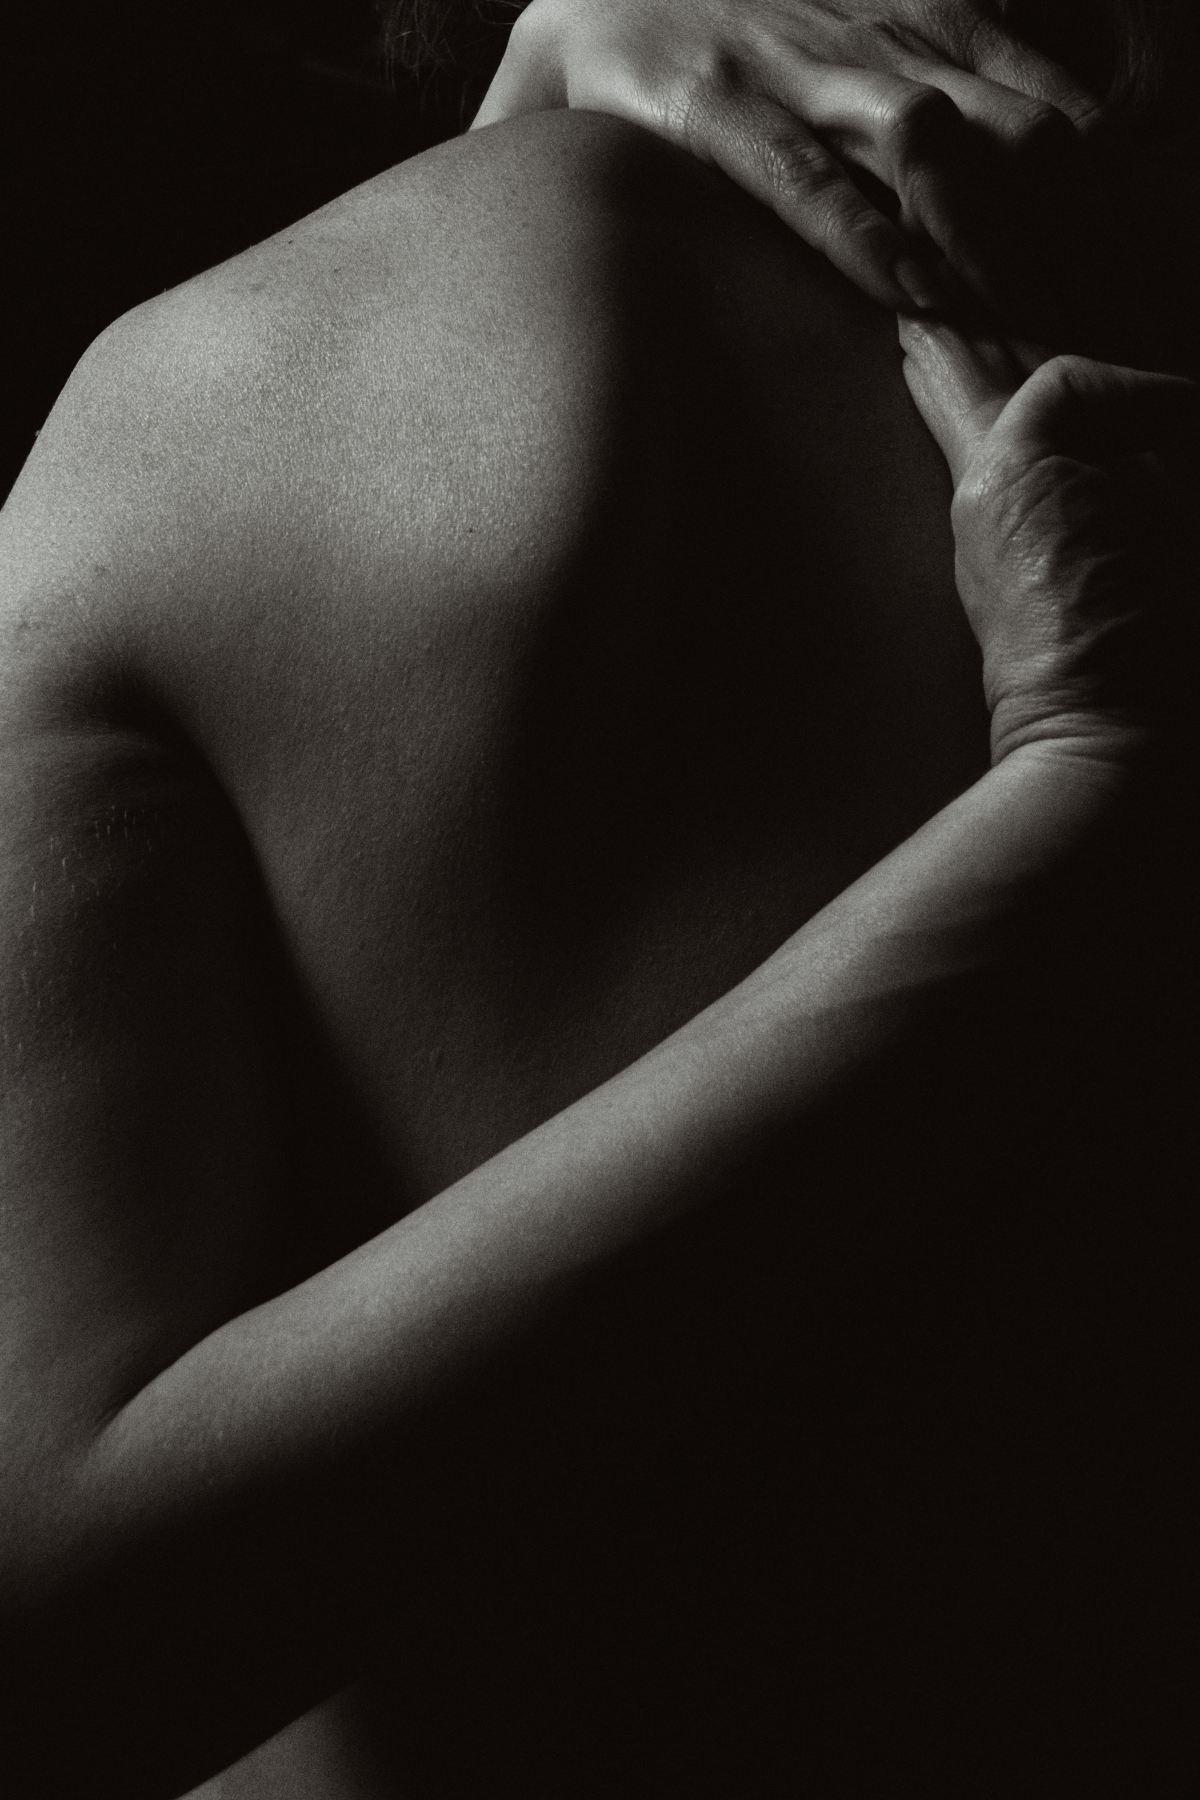 Shoulders back…Shoulders down